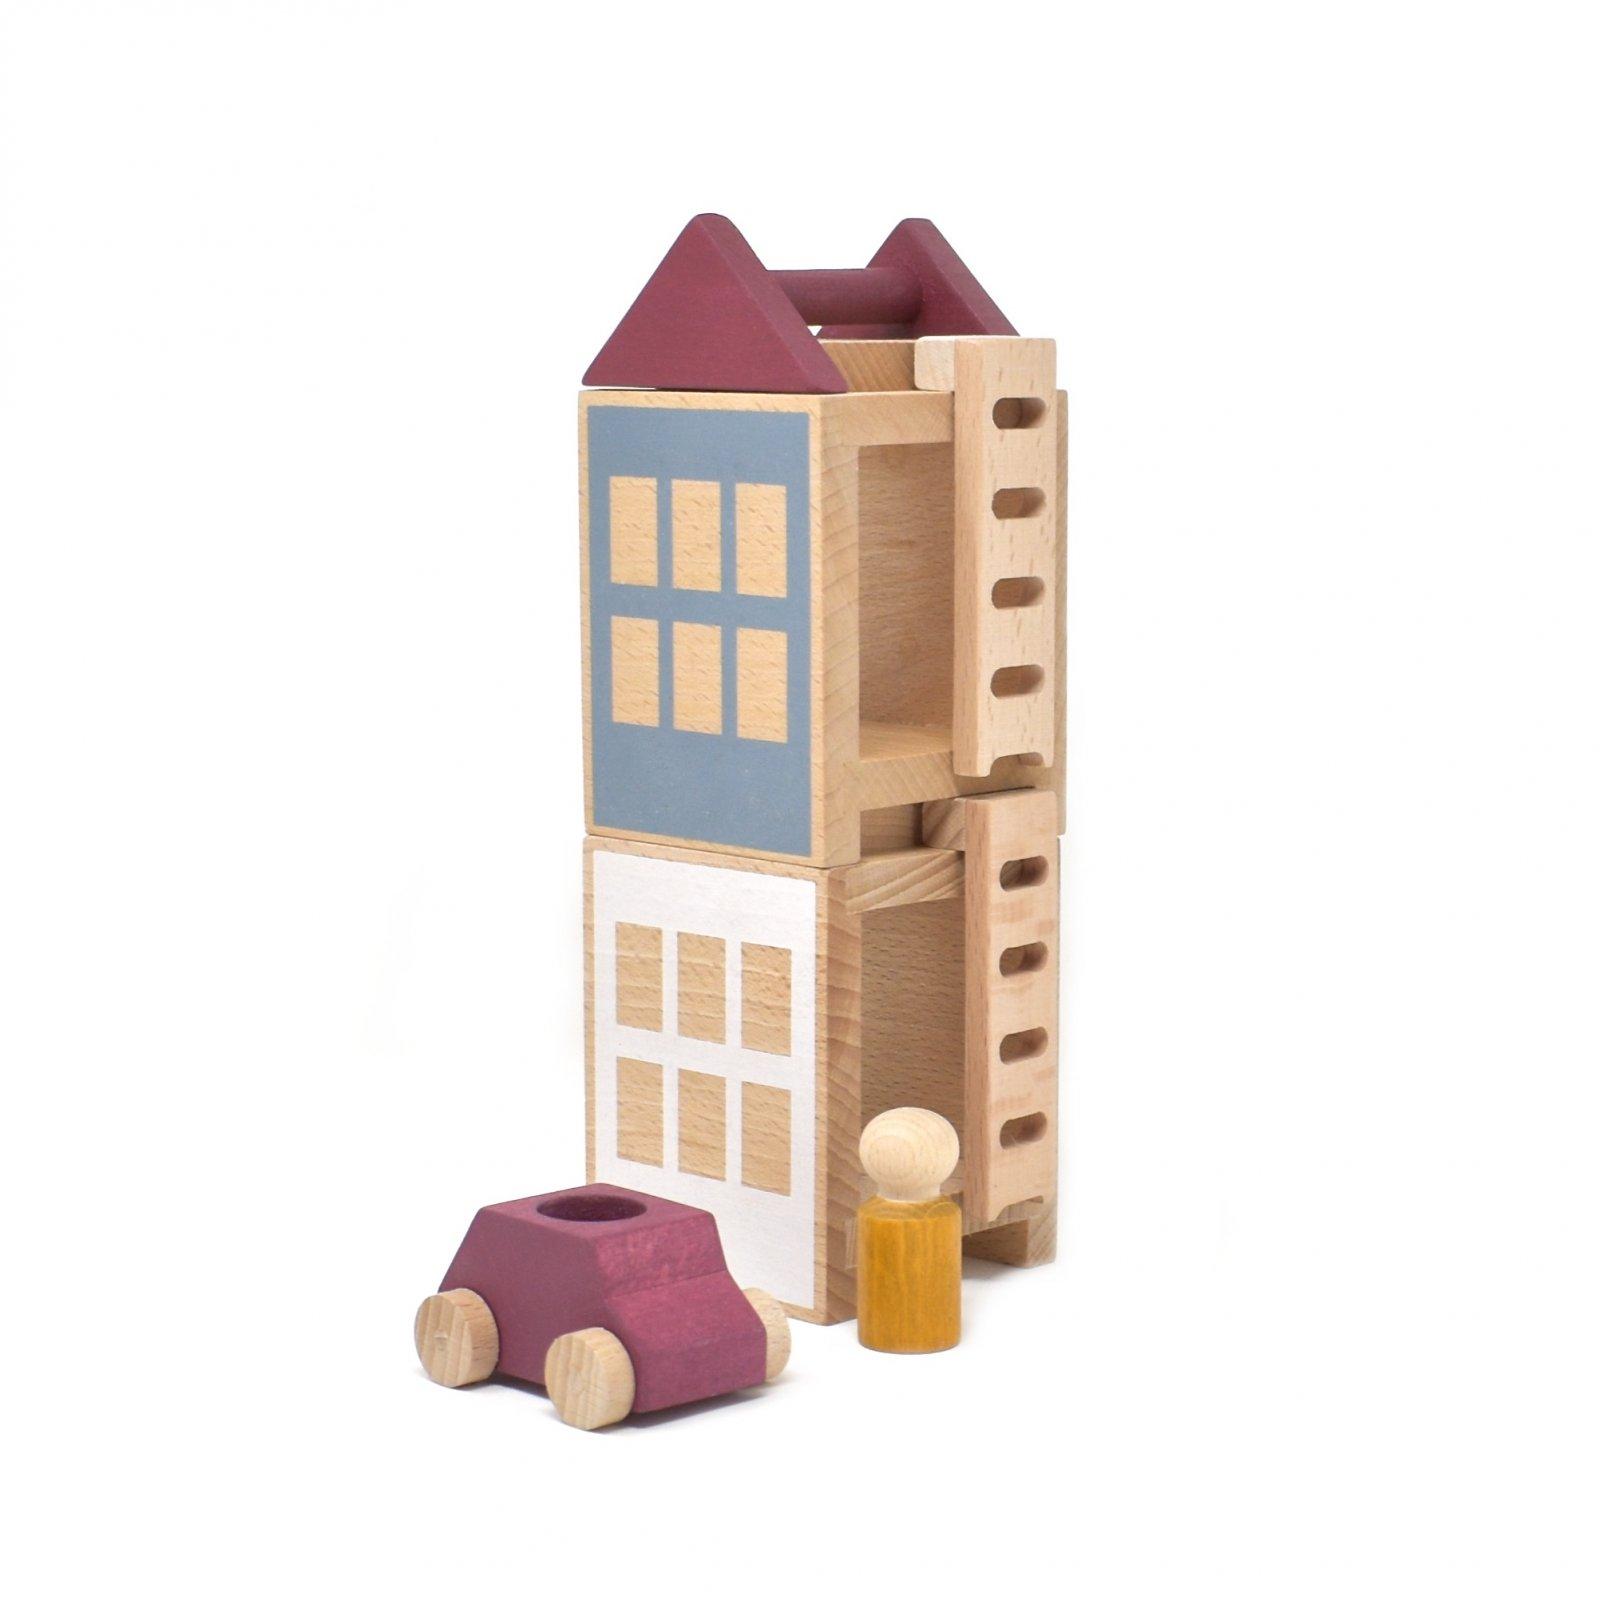 Lubu Town Mini Construction Set - Autumnvale by Lubulona